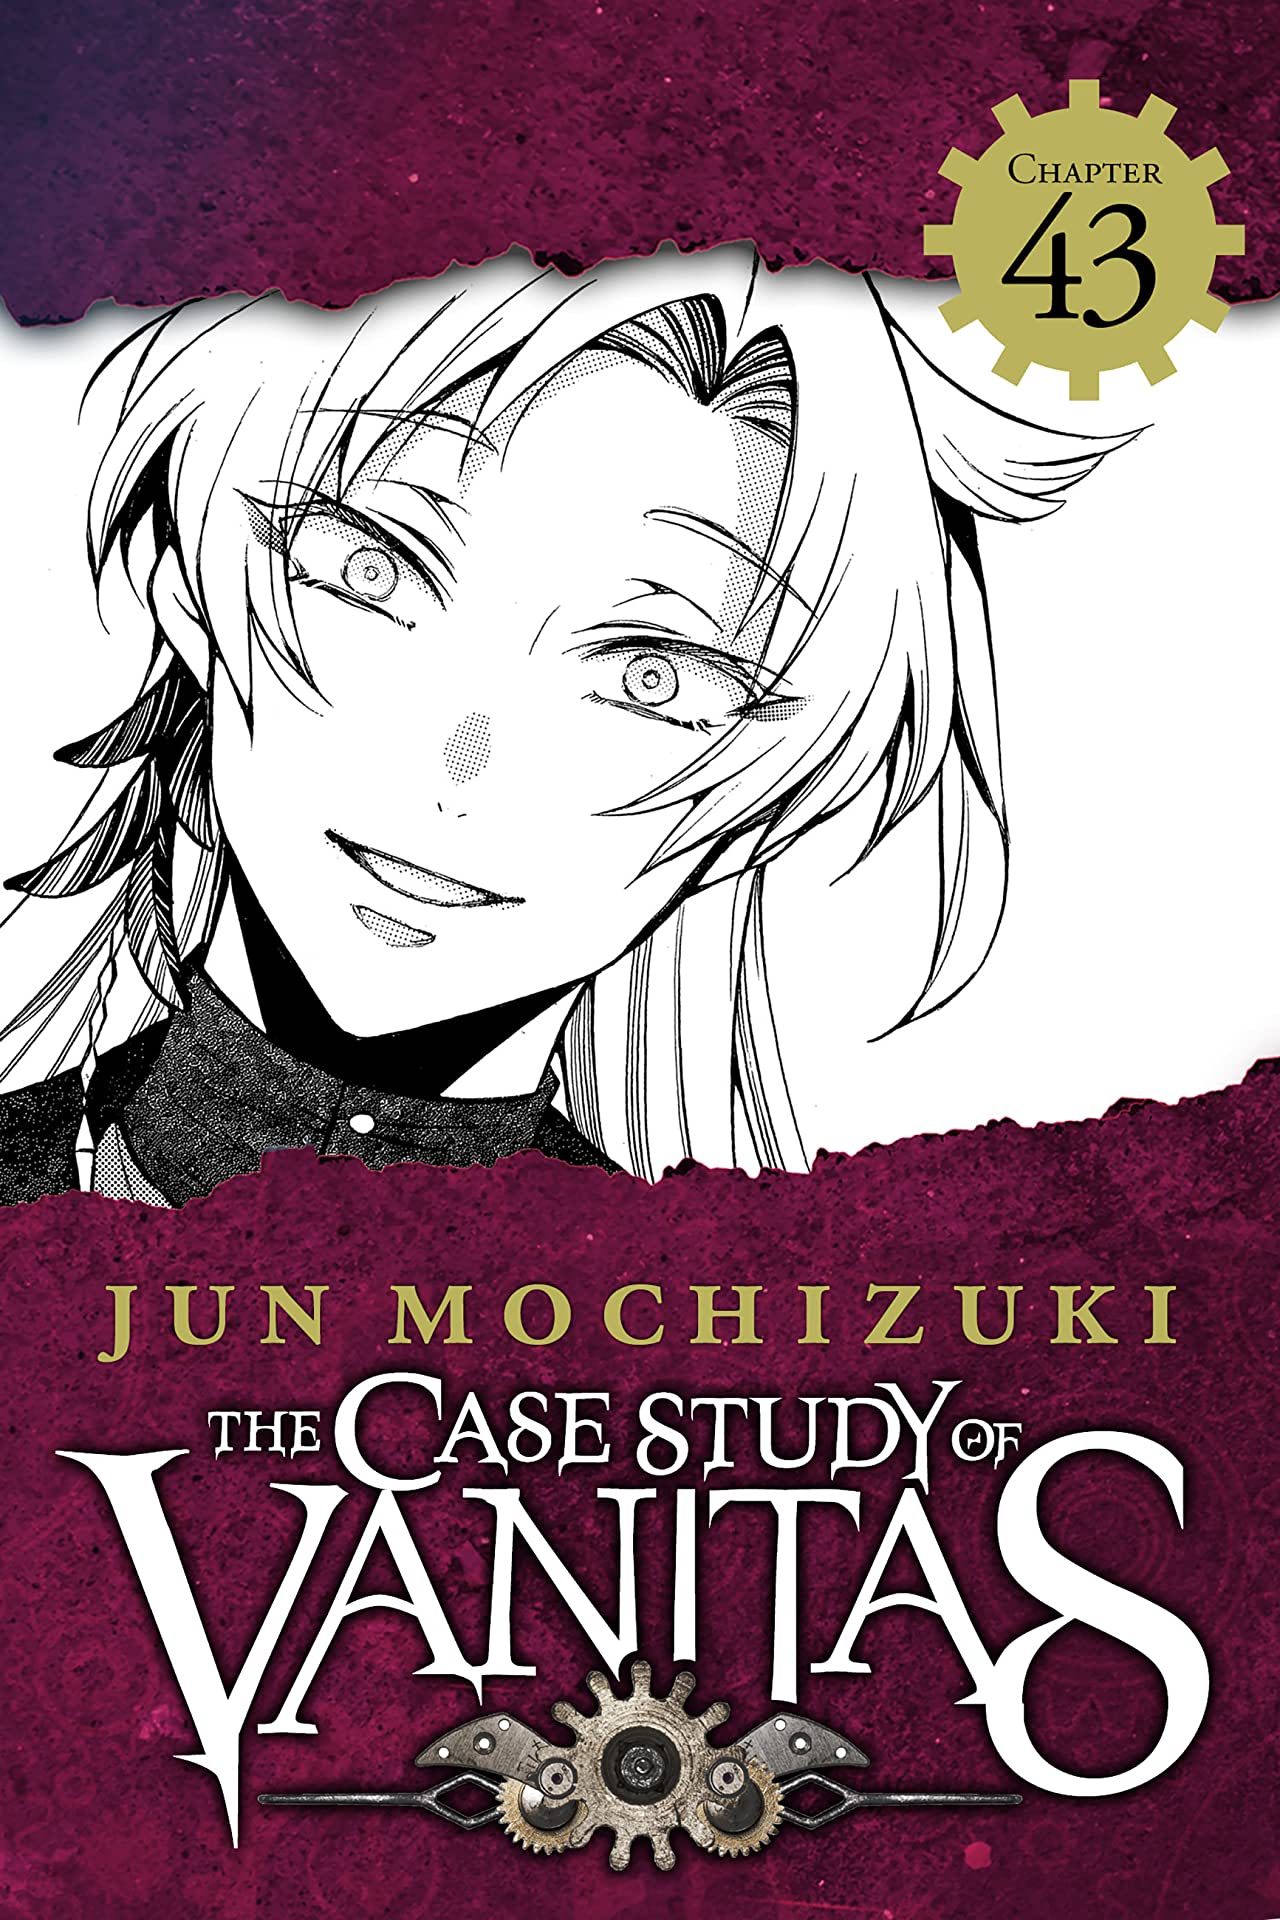 The Case Study of Vanitas #43